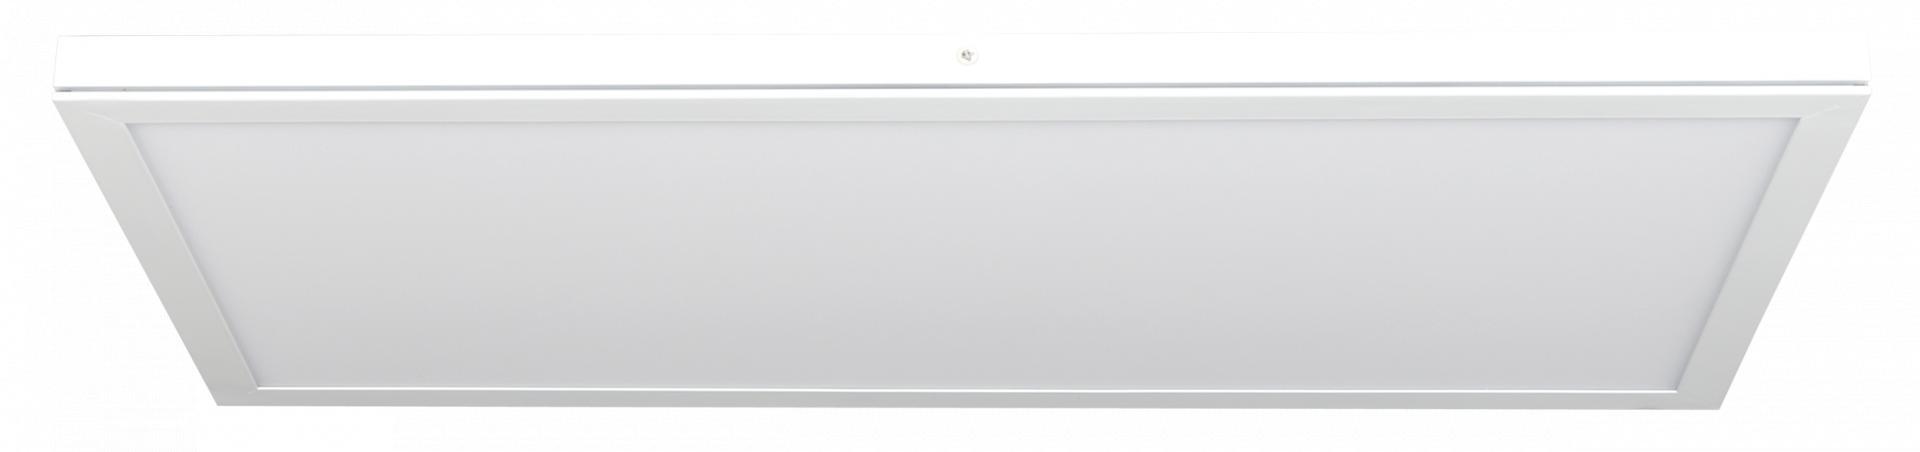 Panel Led Superficie Tolstoi 60x30